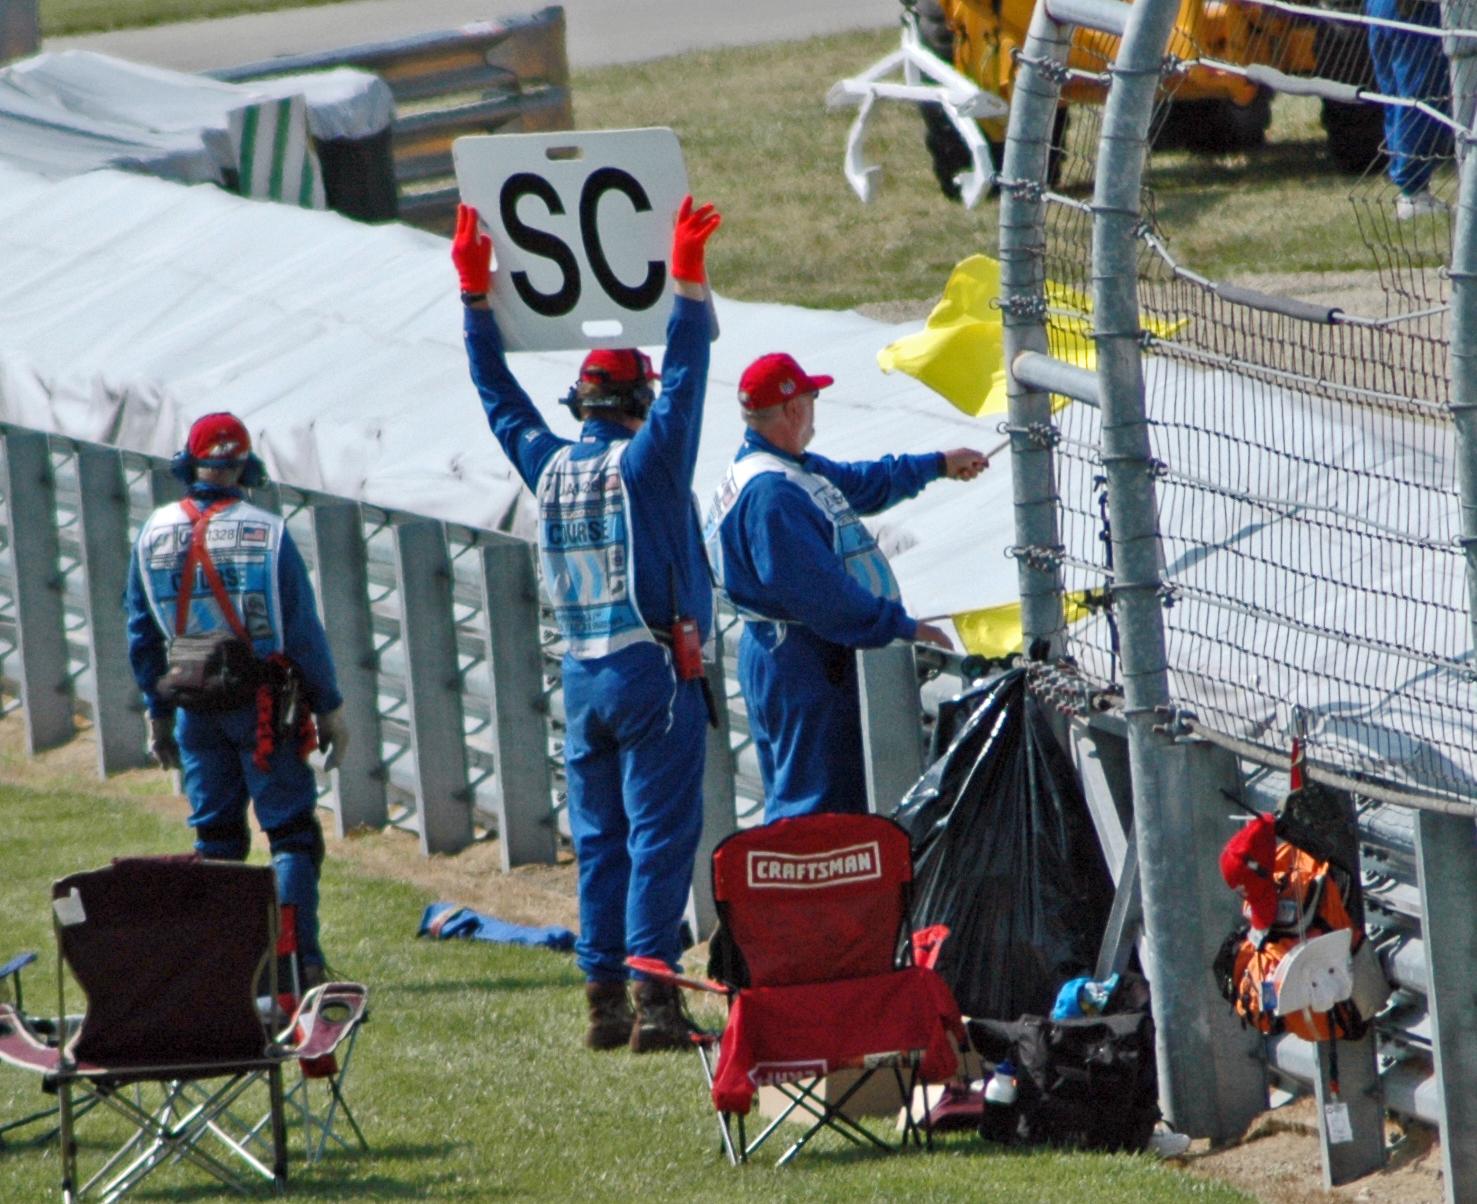 Coche de seguridad | Wiki Fórmula 1 | FANDOM powered by Wikia